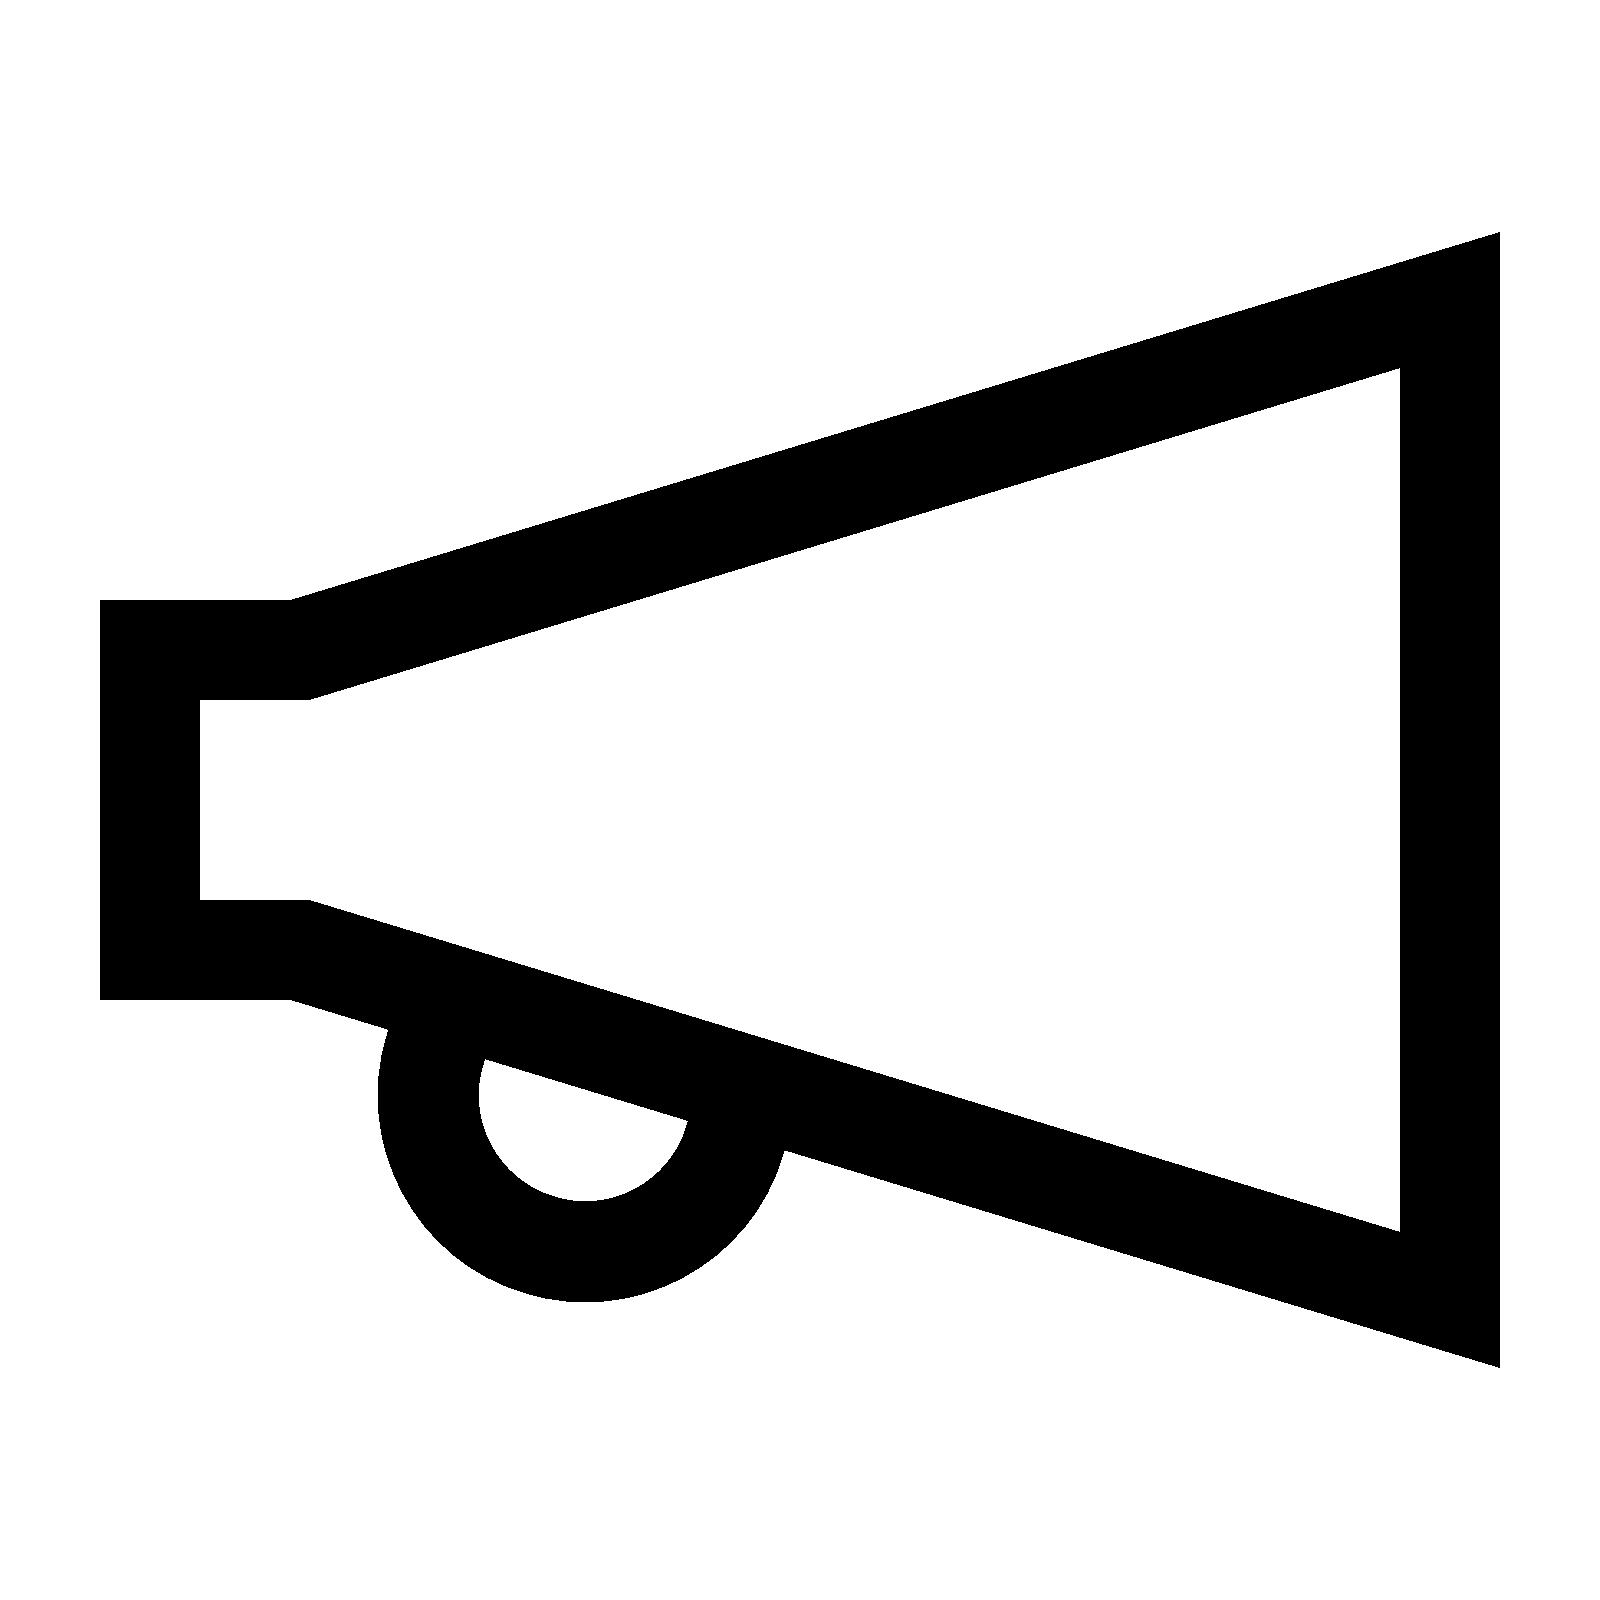 Megaphone icon - PNG Megaphone Free